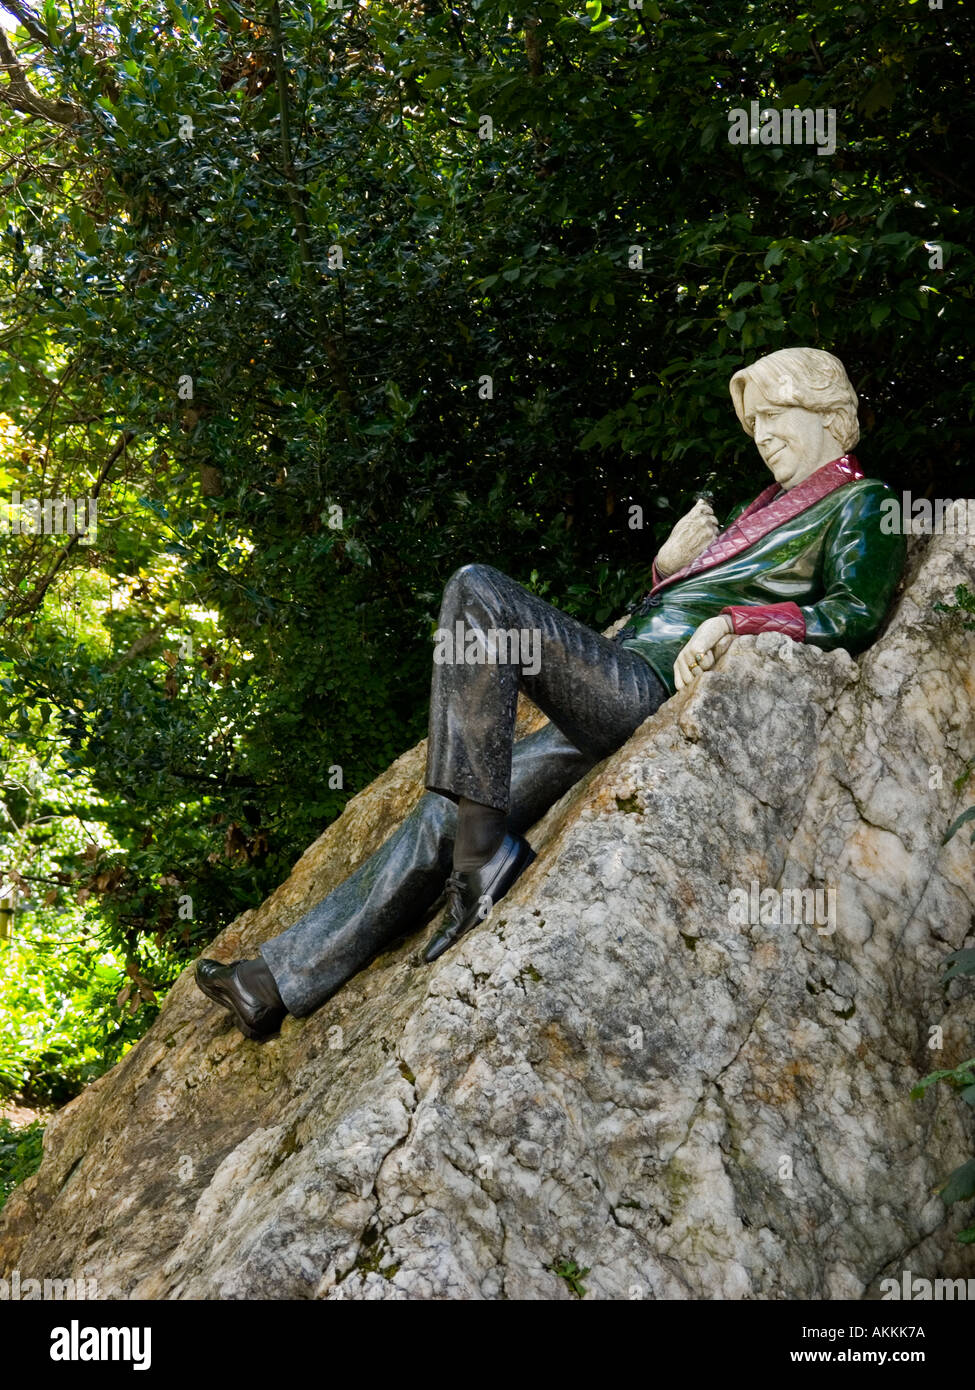 A lifesize sculpture of Oscar Wilde, by Danny Osborne, in  Merrion Square, Dublin, Ireland - Stock Image